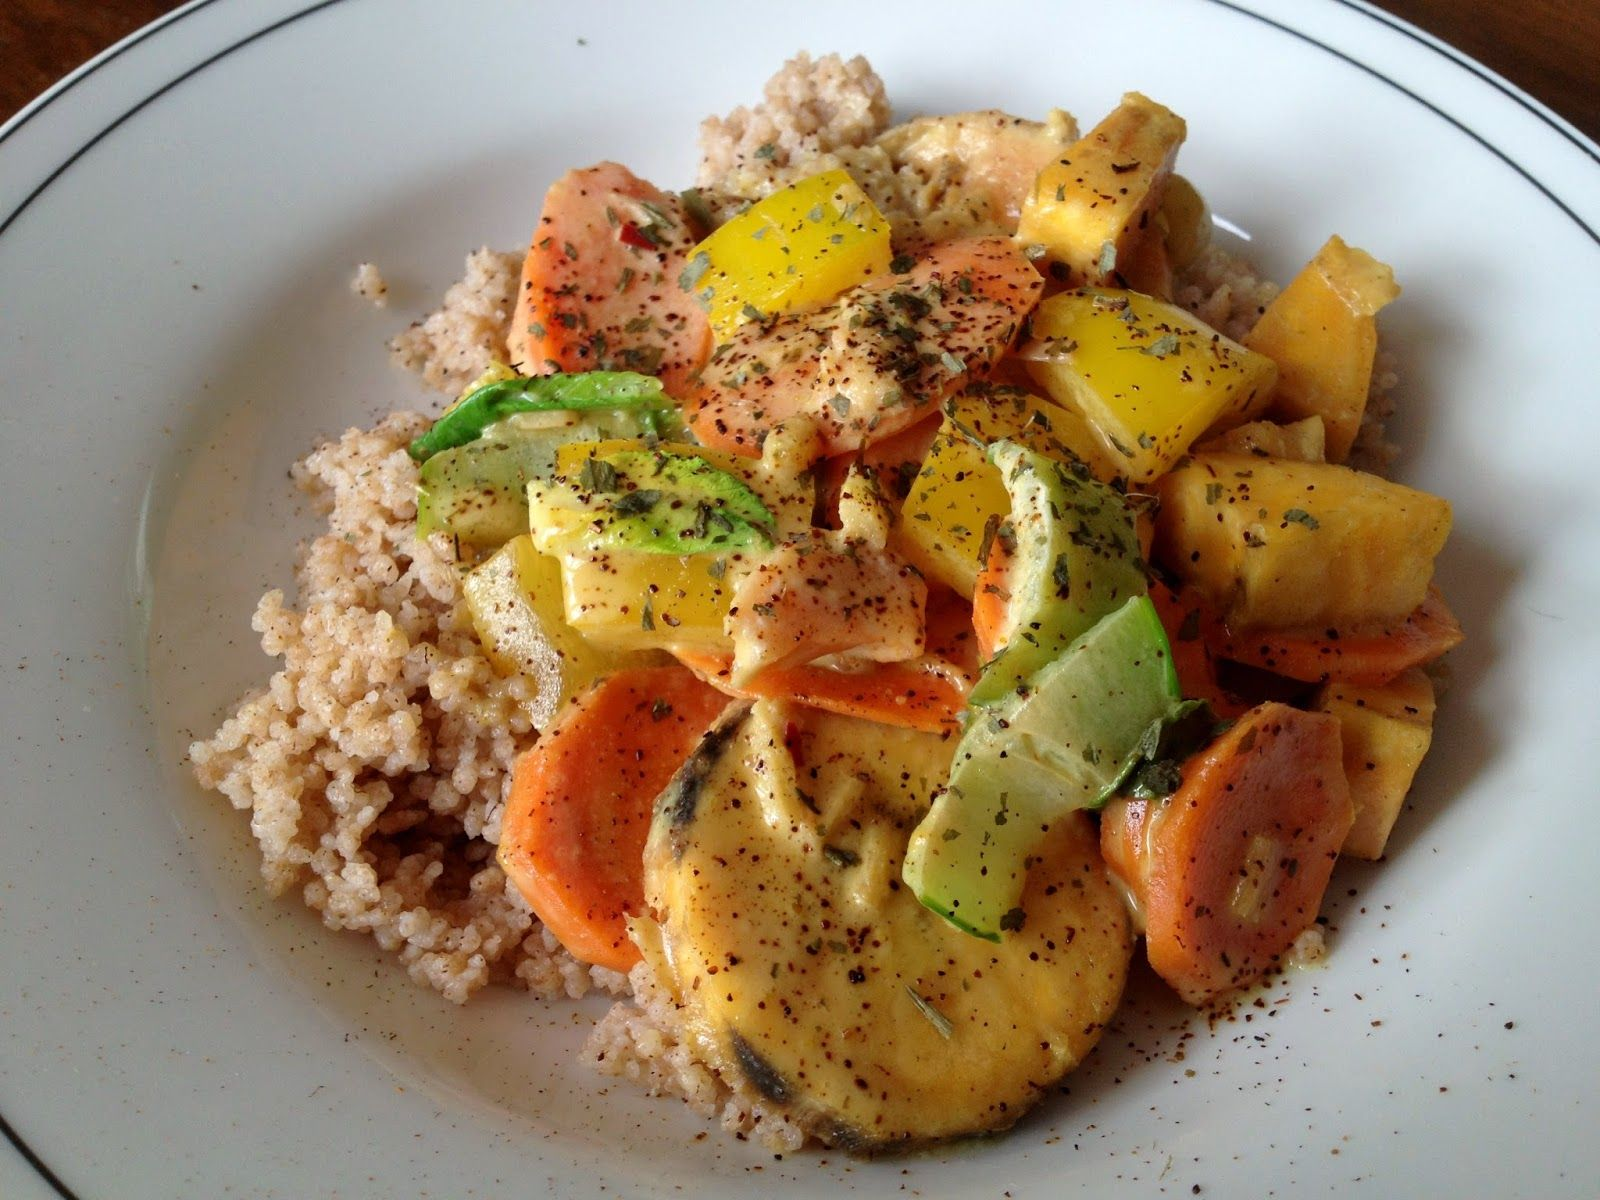 Die fabelhafte Welt der Franca Tütü:  eat  Kokos.Curry auf afrikanisch...